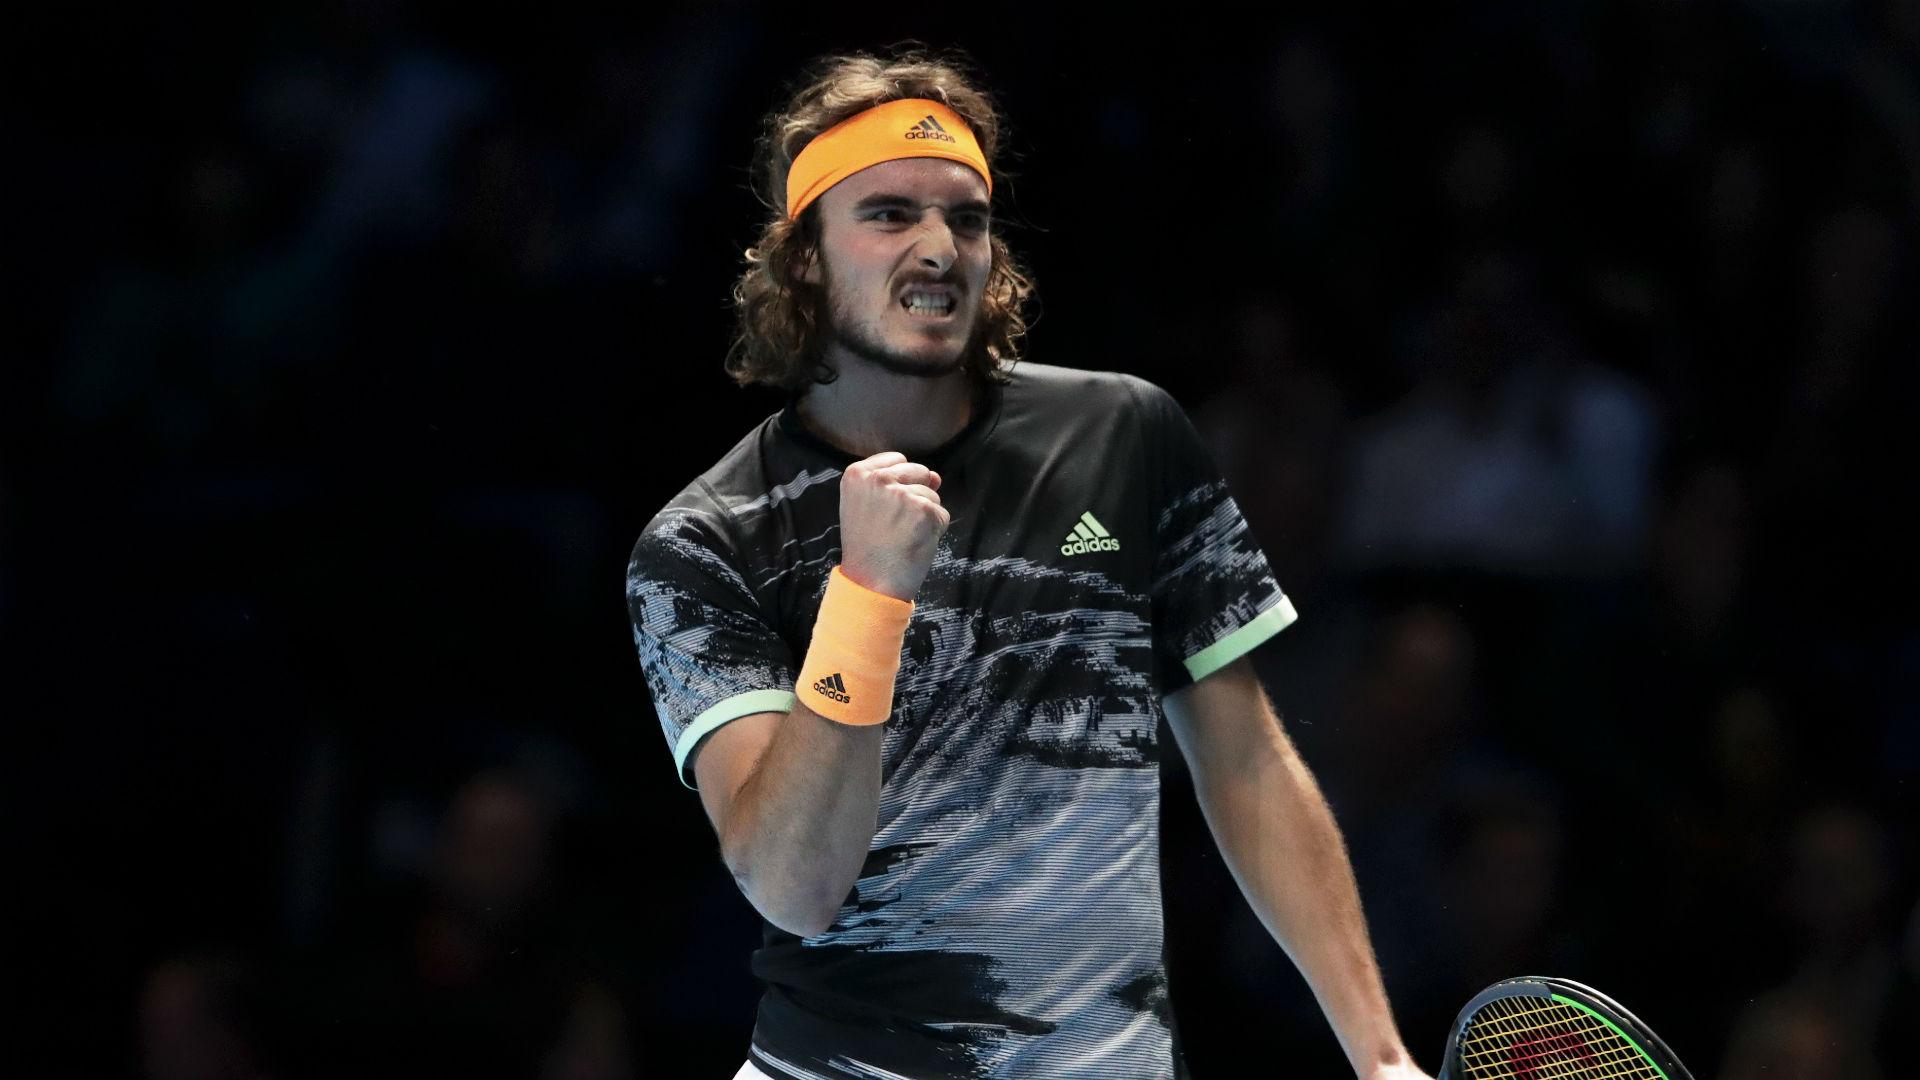 Tsitsipas beats defending champion Zverev to progress at ATP Finals